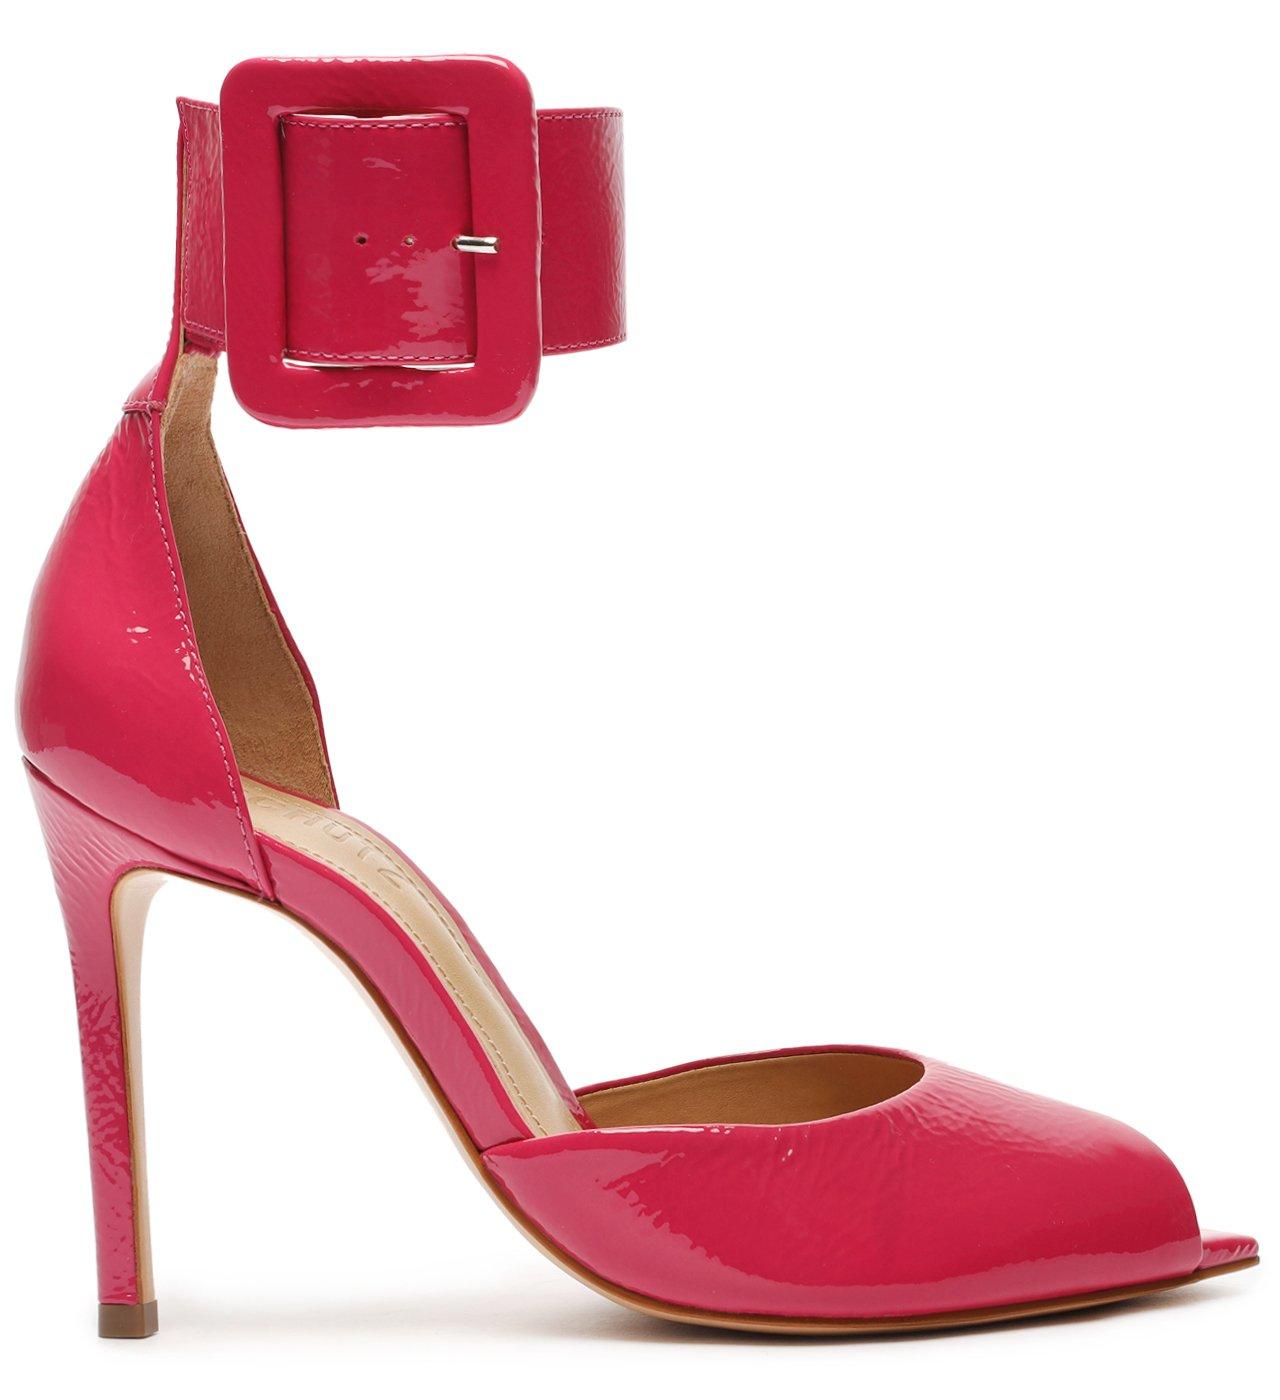 Sapato Scarpin Salto Alto Verniz Vermelho | Schutz